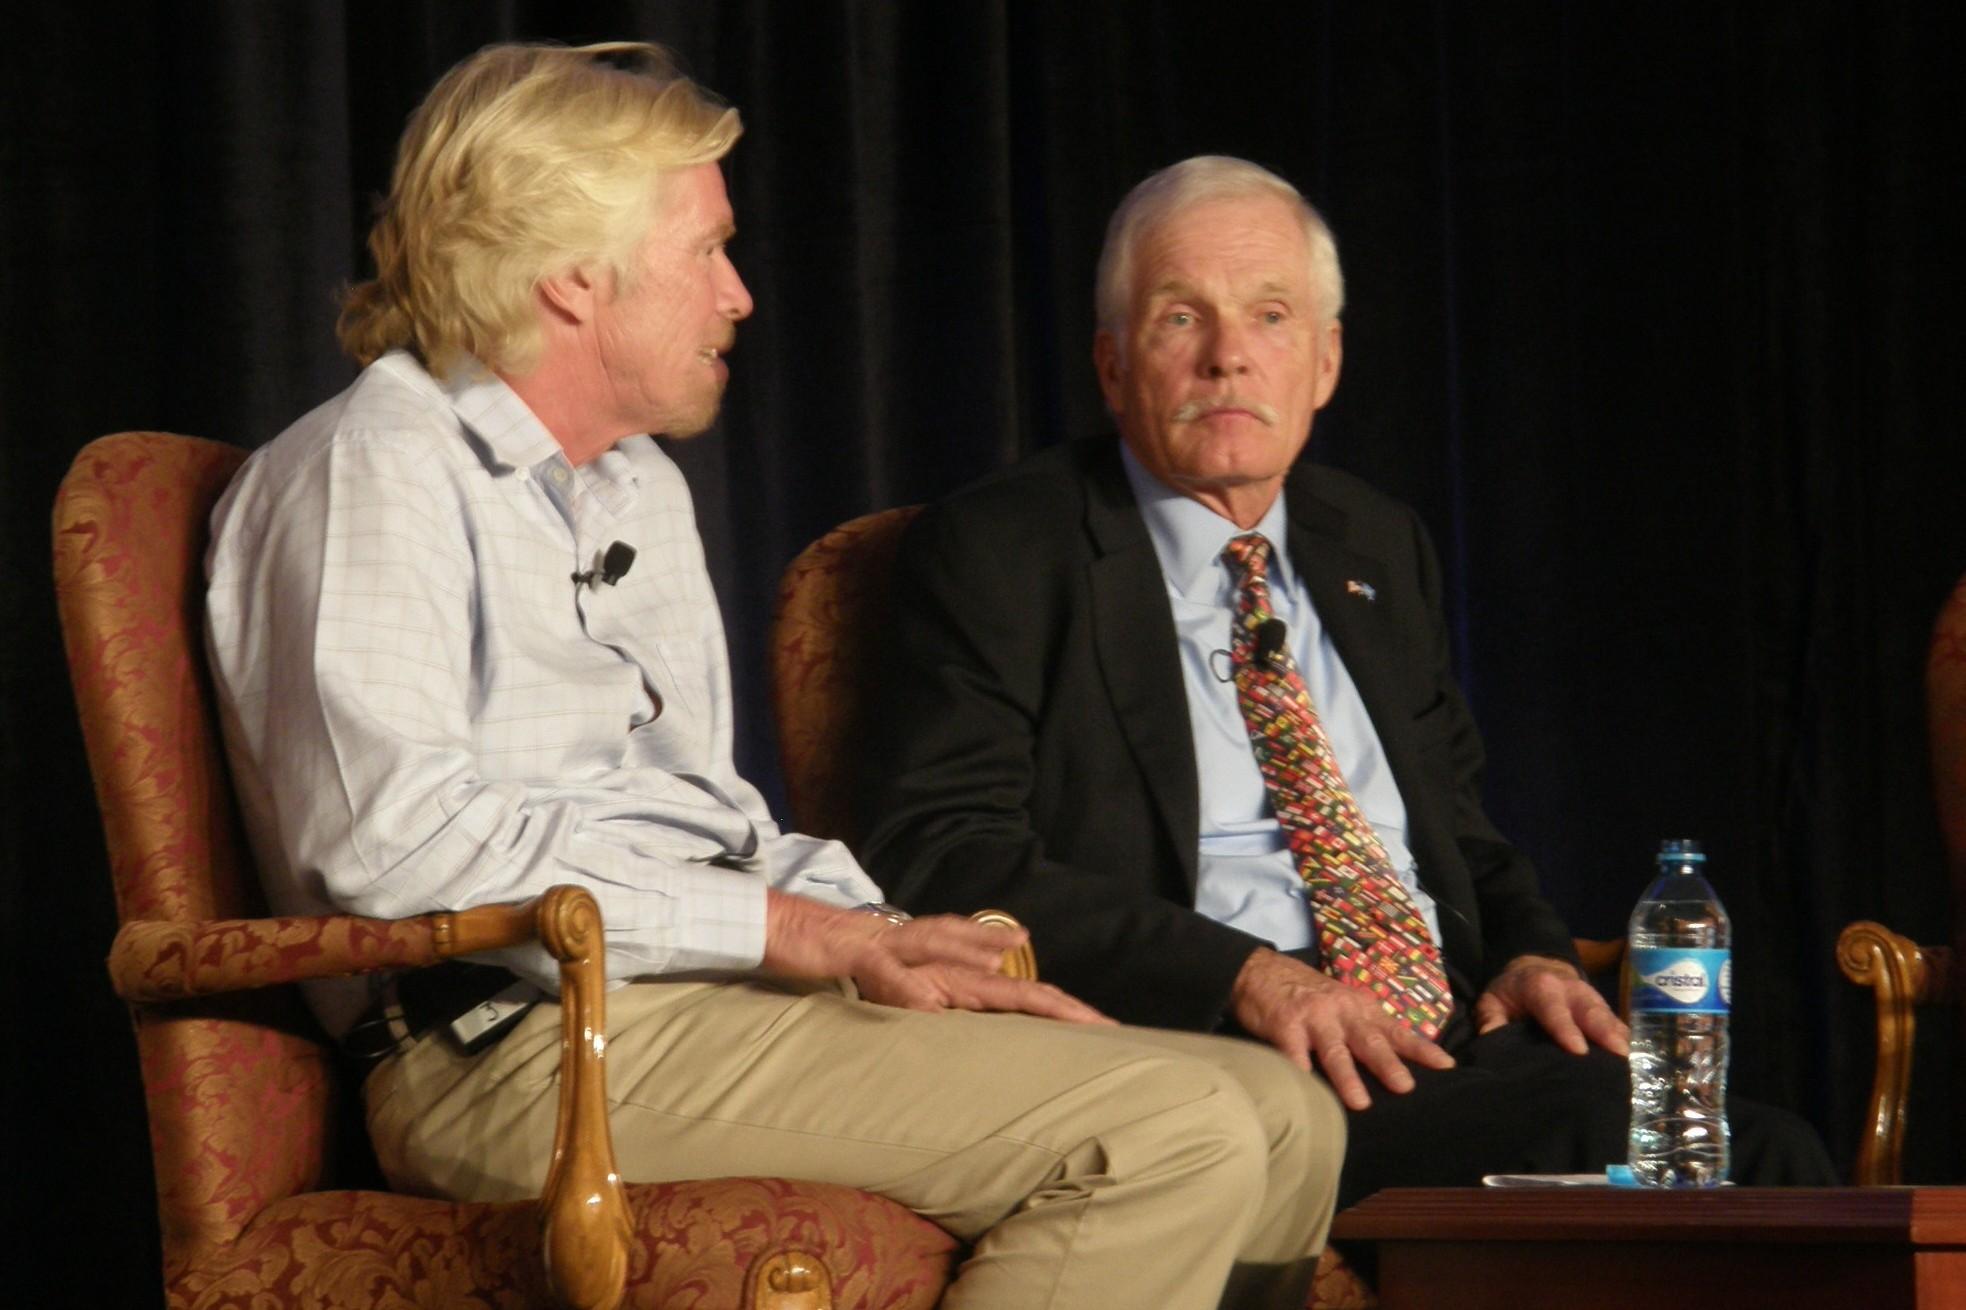 Richard Branson & Ted Turner at World Climate Summit